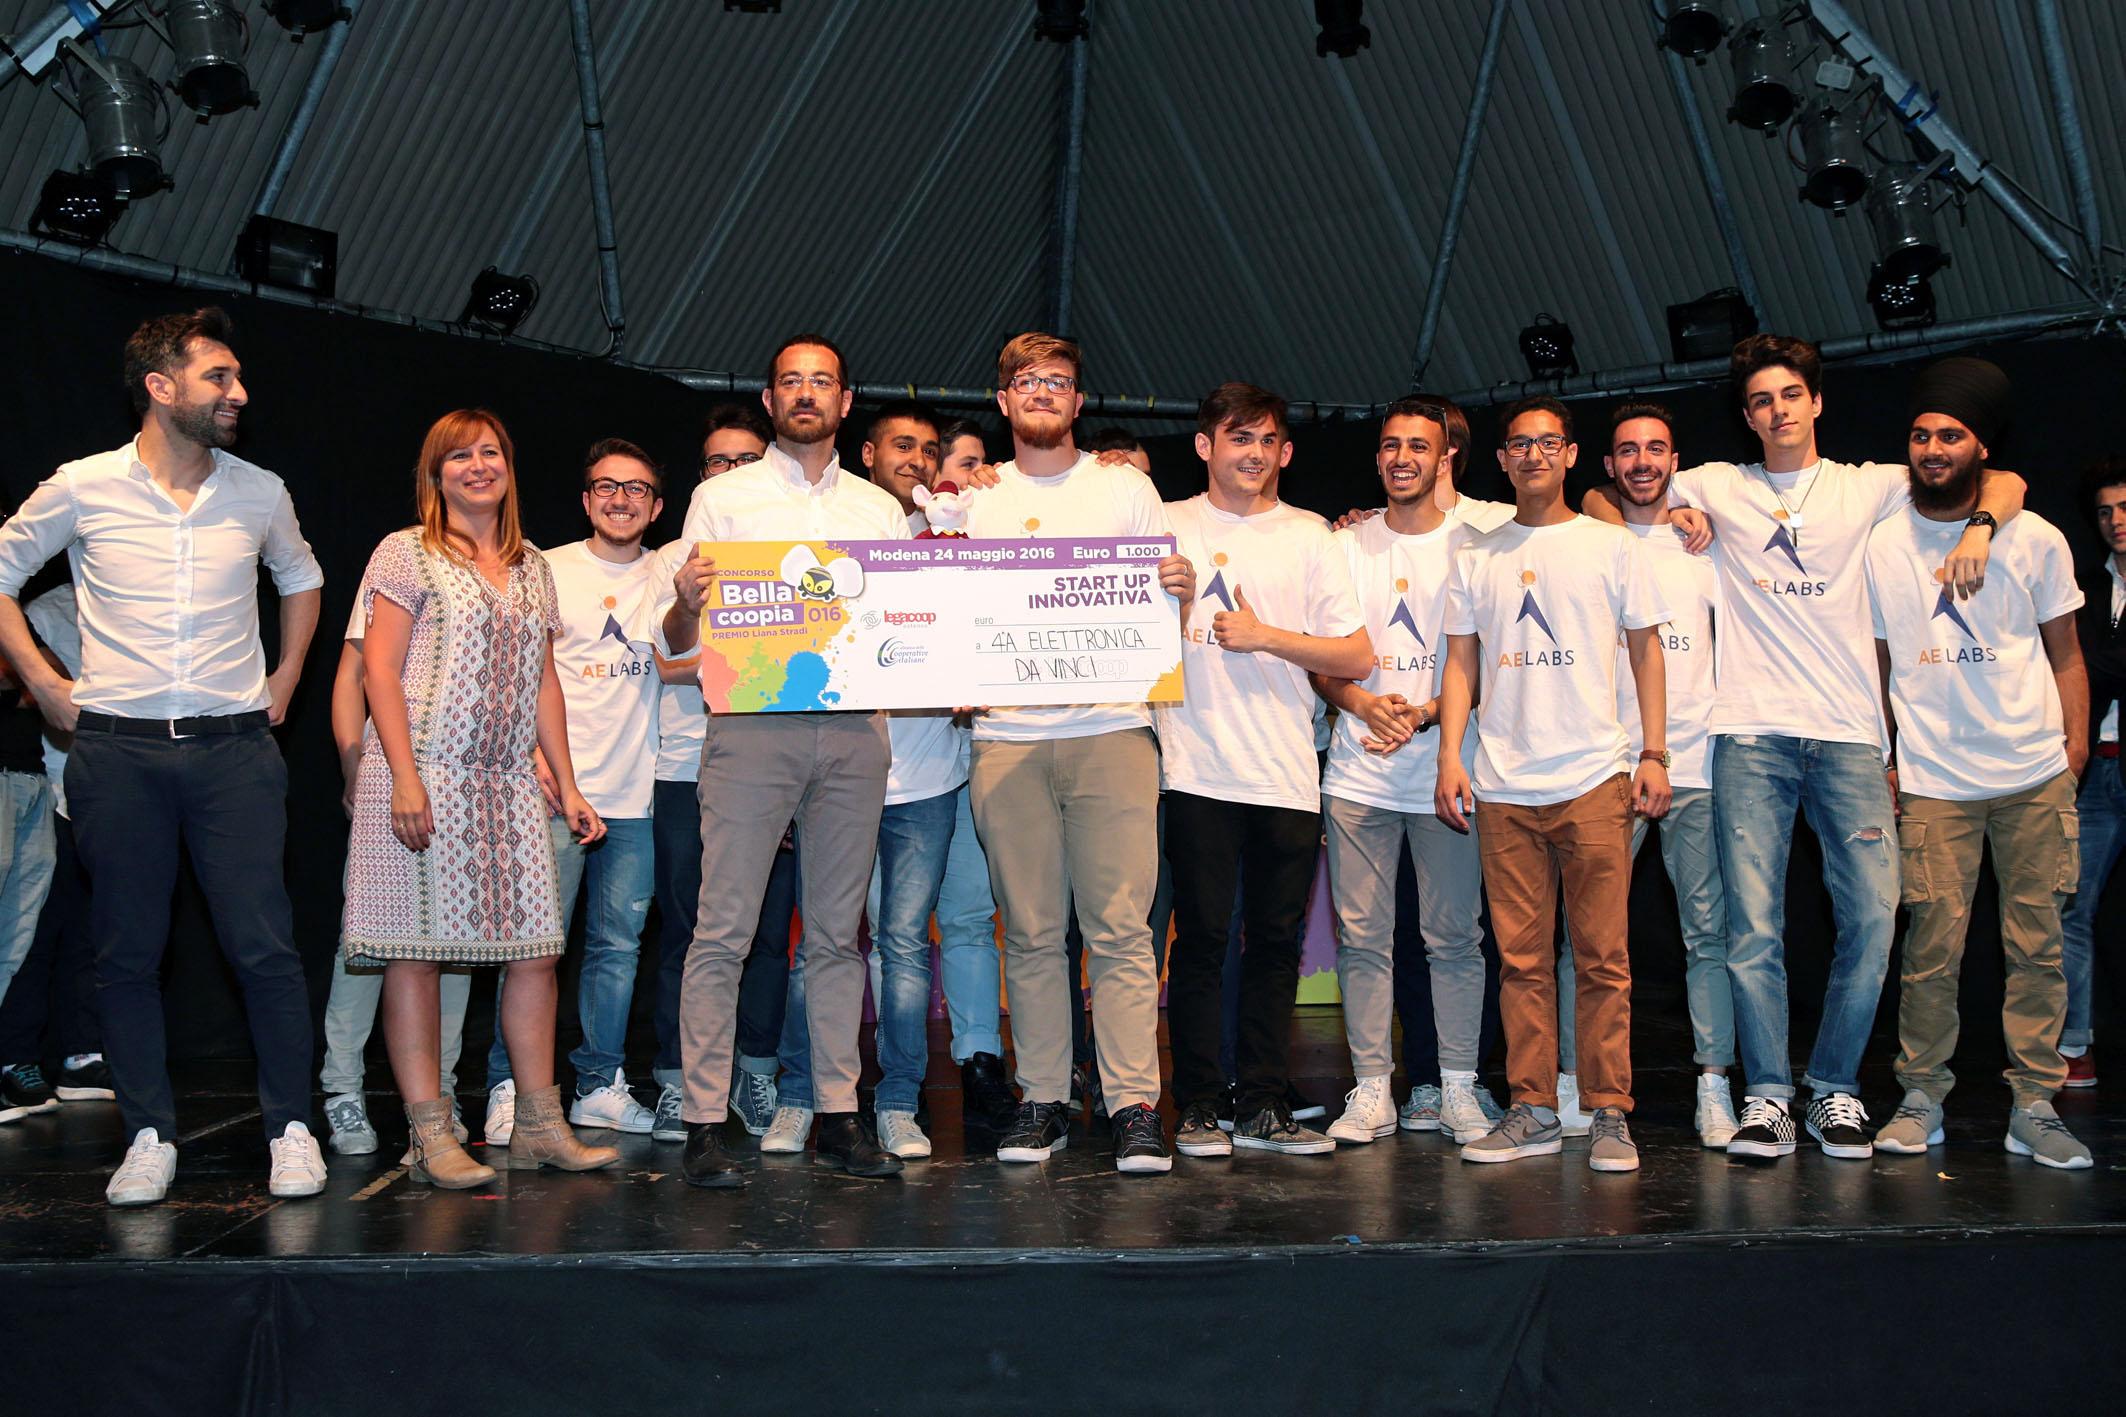 Bellacoopia 2016: Carpi fa incetta di premi!